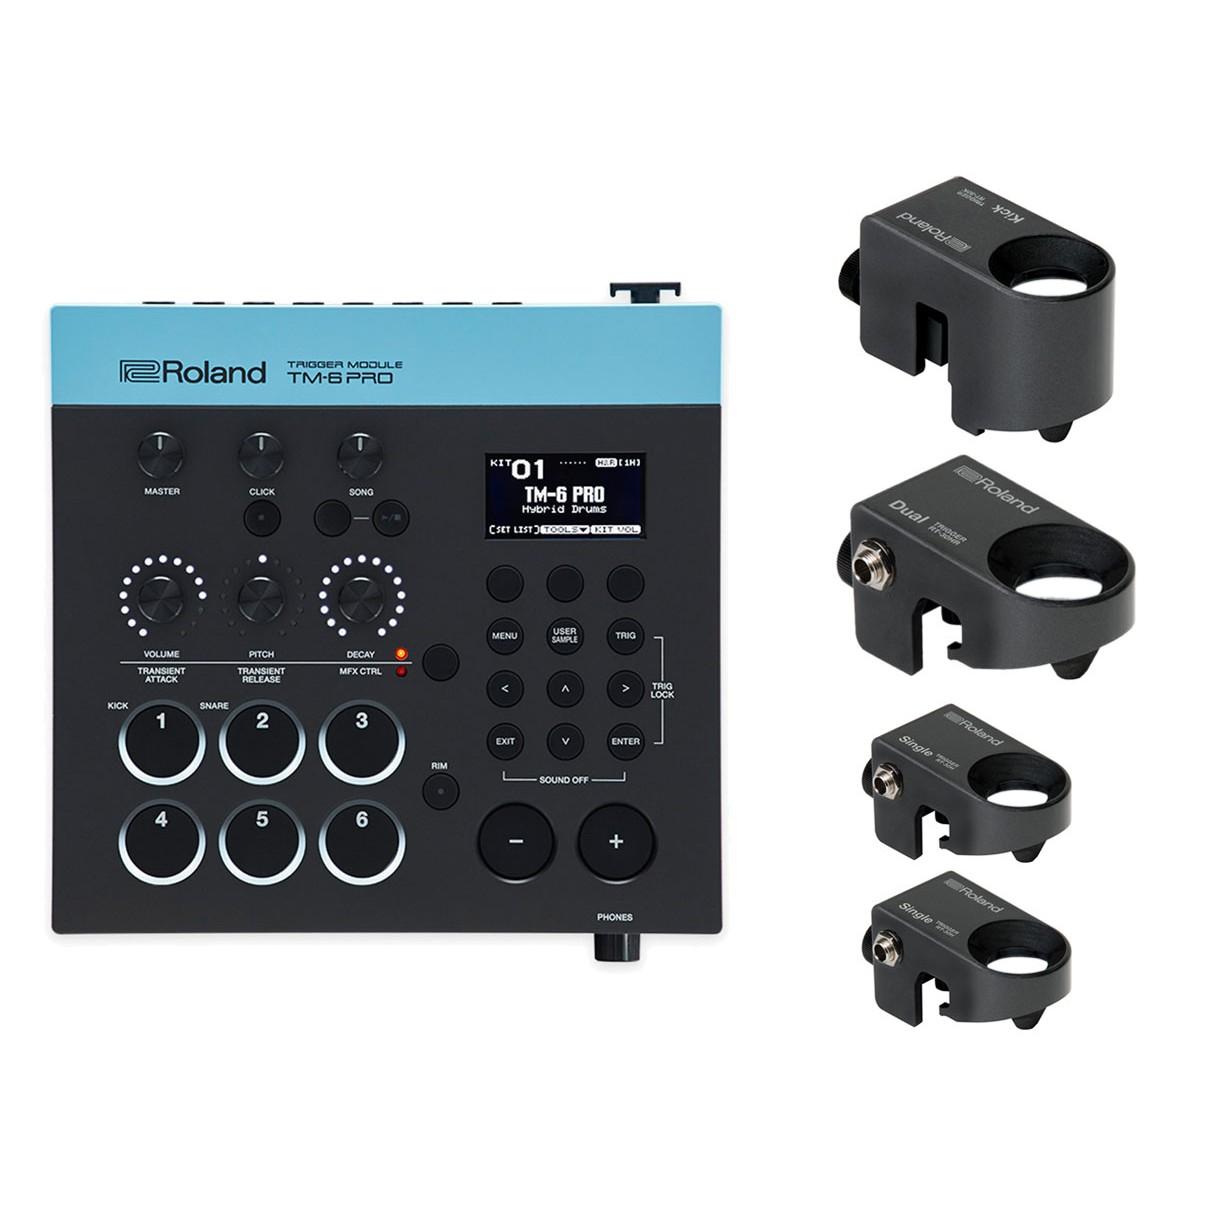 roland tm 6 pro drum trigger module 4x roland rt30 drum triggers. Black Bedroom Furniture Sets. Home Design Ideas